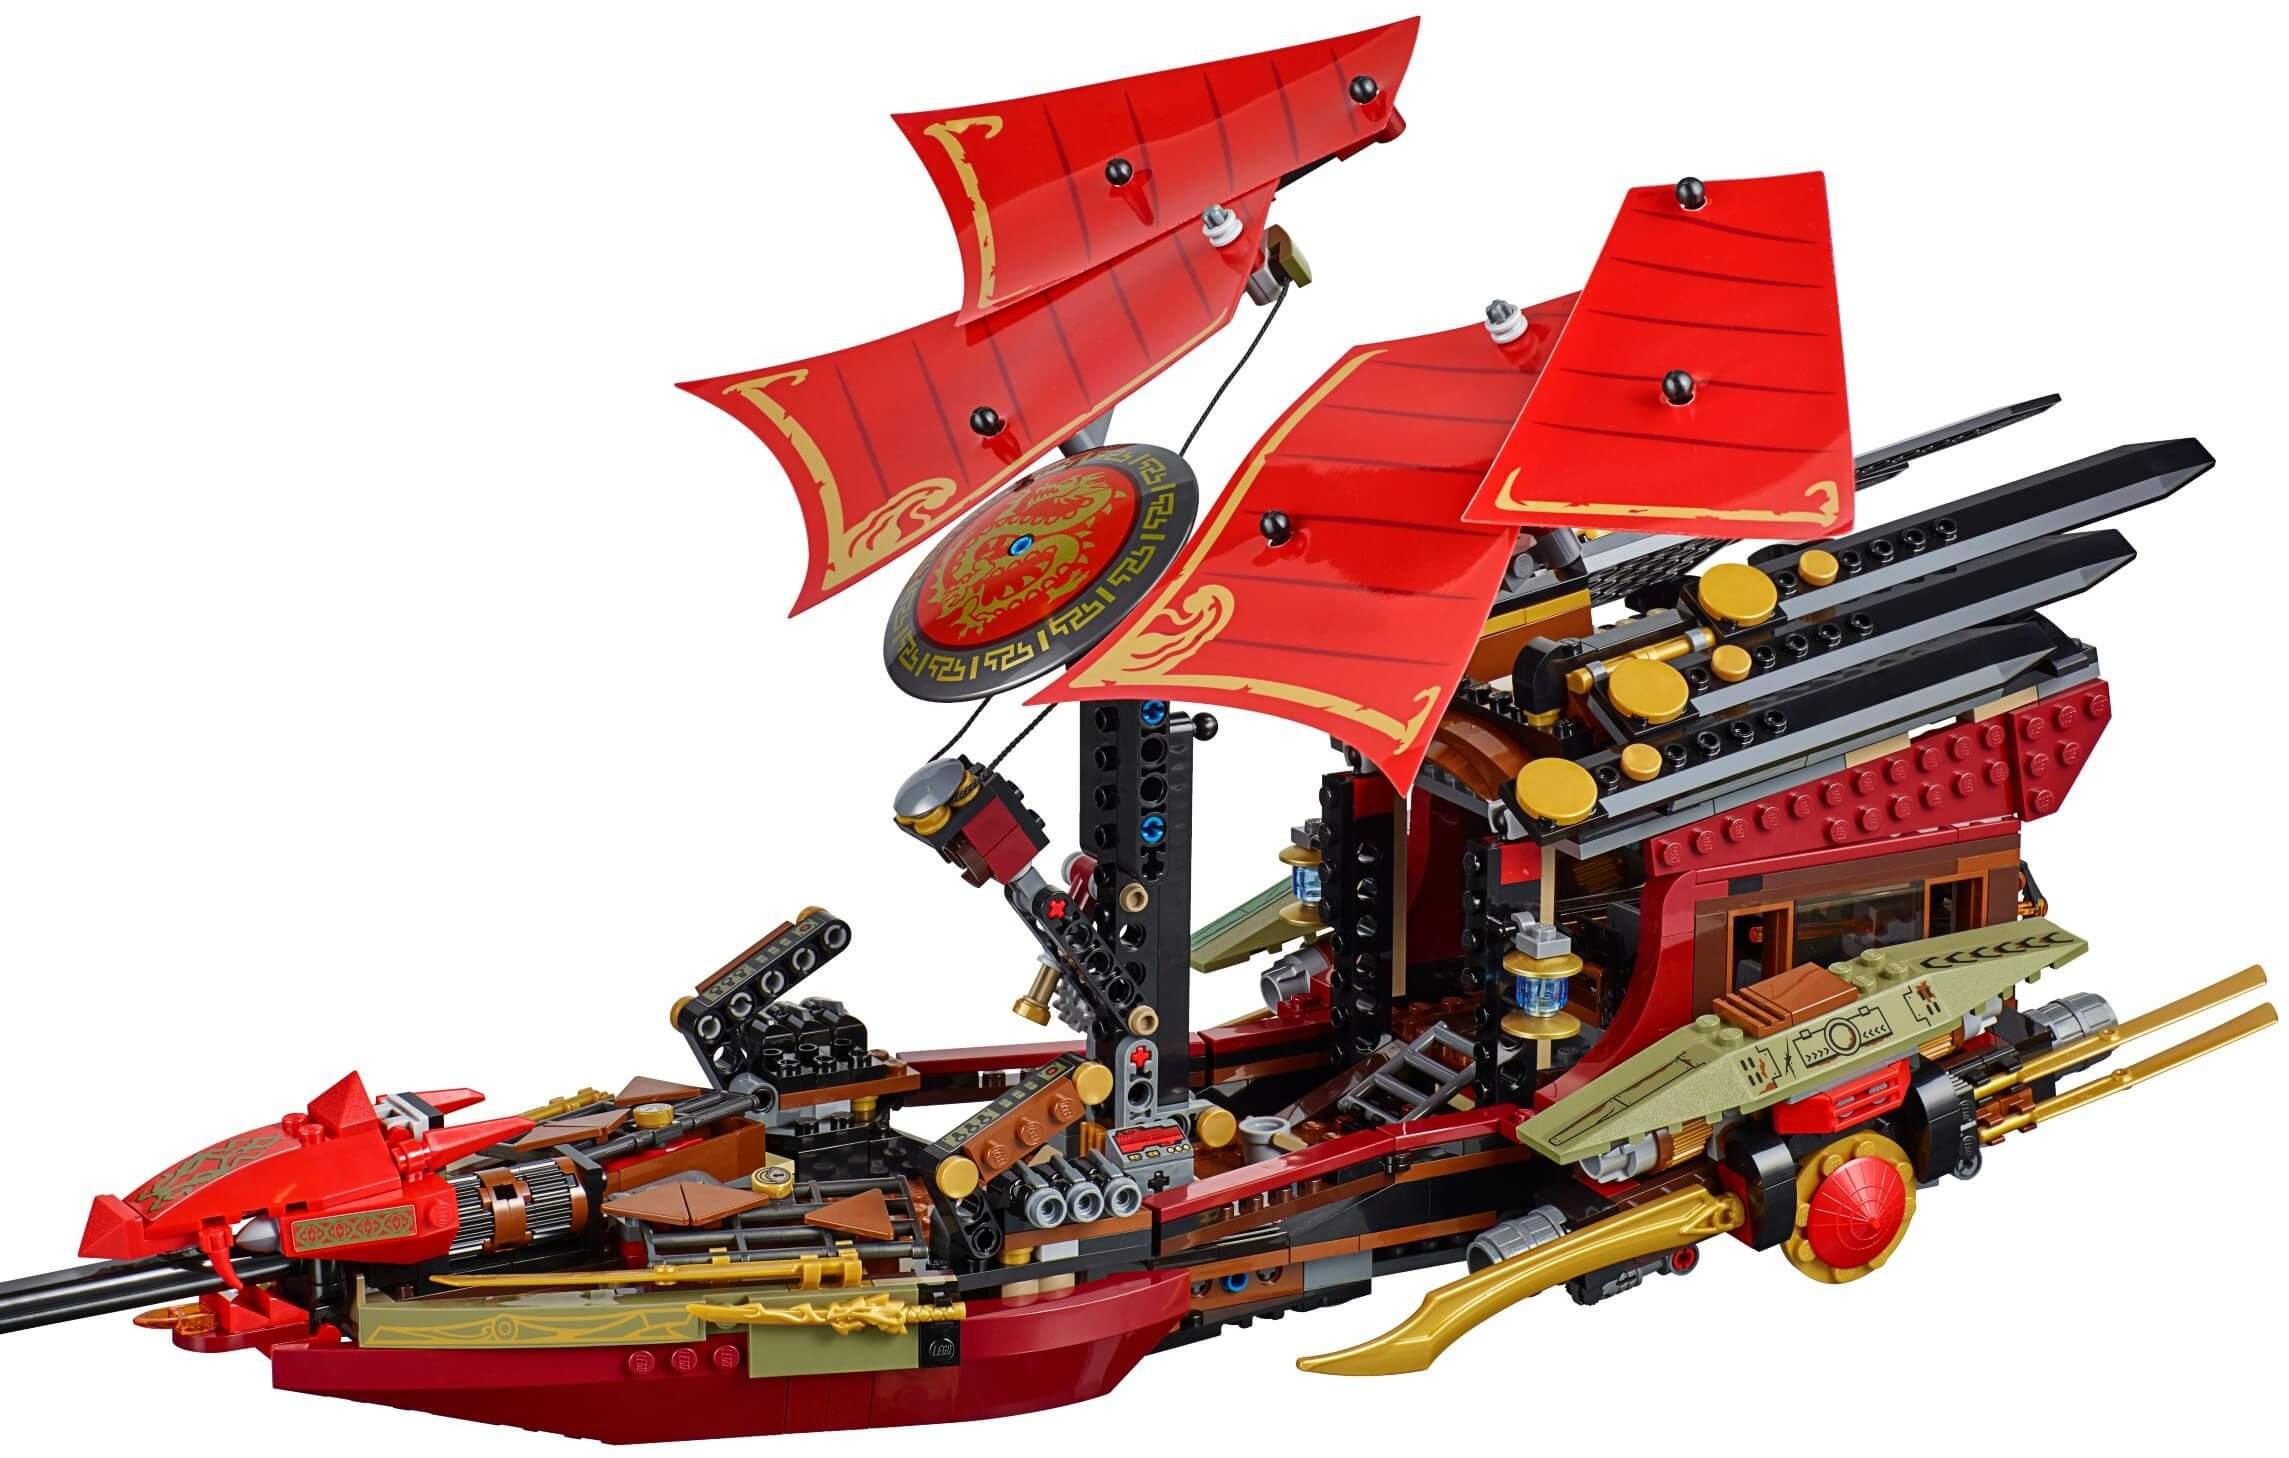 Mua đồ chơi LEGO 70738 - LEGO Ninjago 70738 - Siêu tàu chiến Destiny's Bounty (LEGO Ninjago Final Flight of Destiny's Bounty 70738)